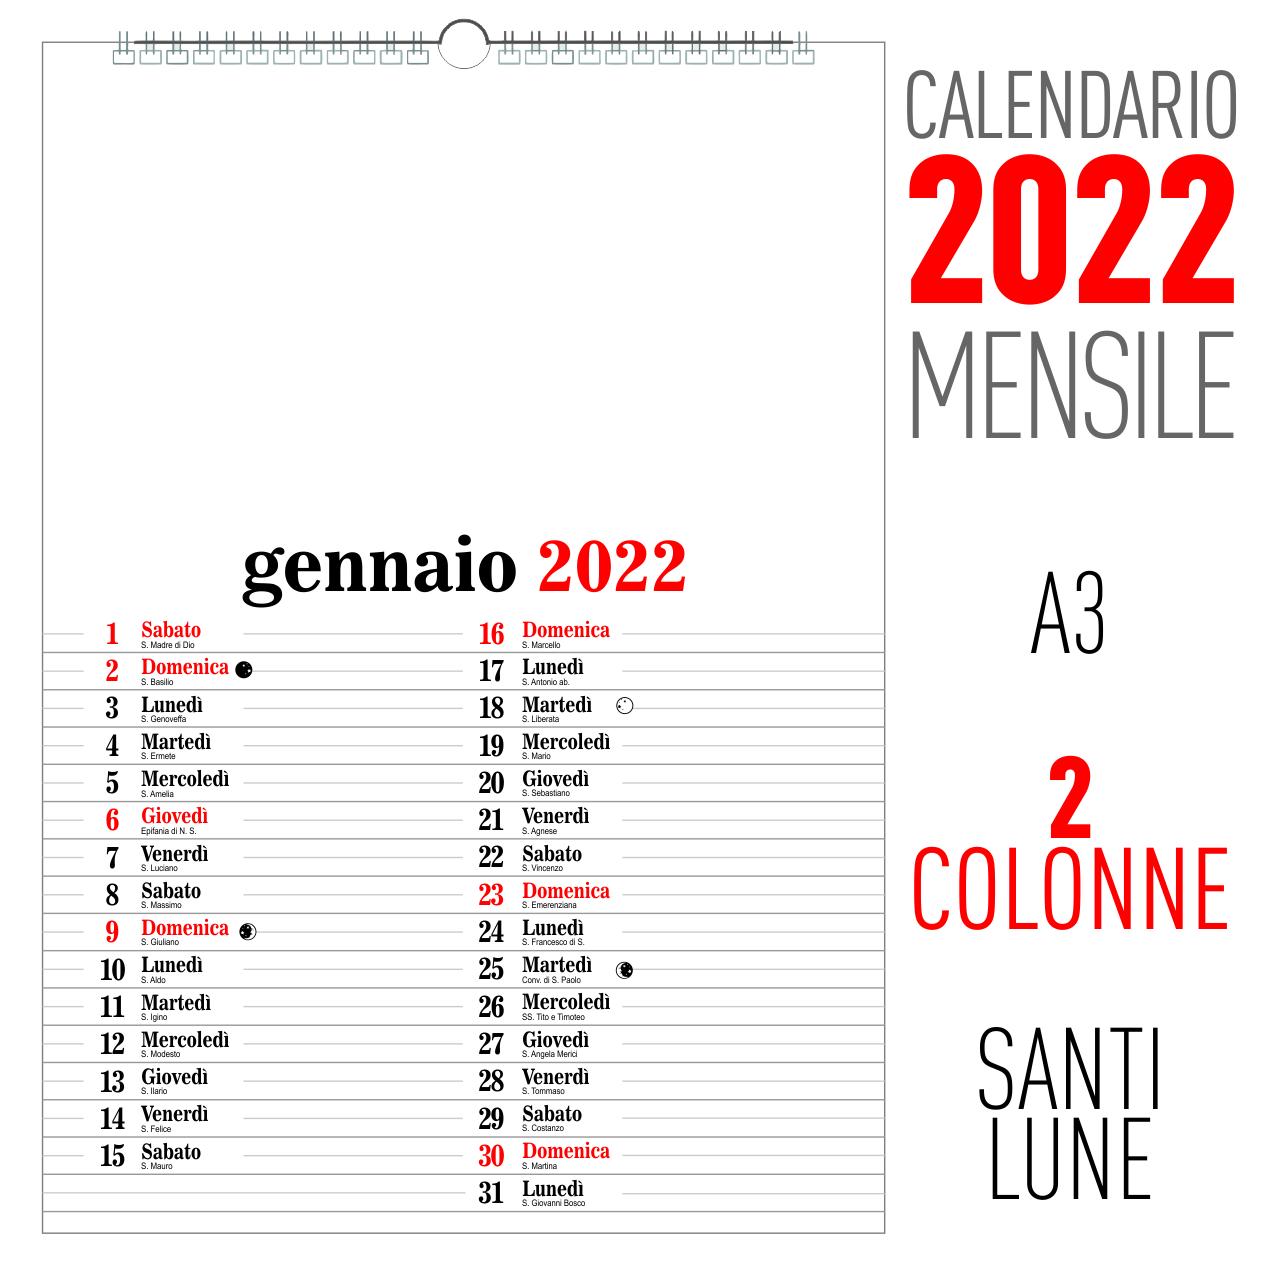 calendario 2022 mensile 2 colonne